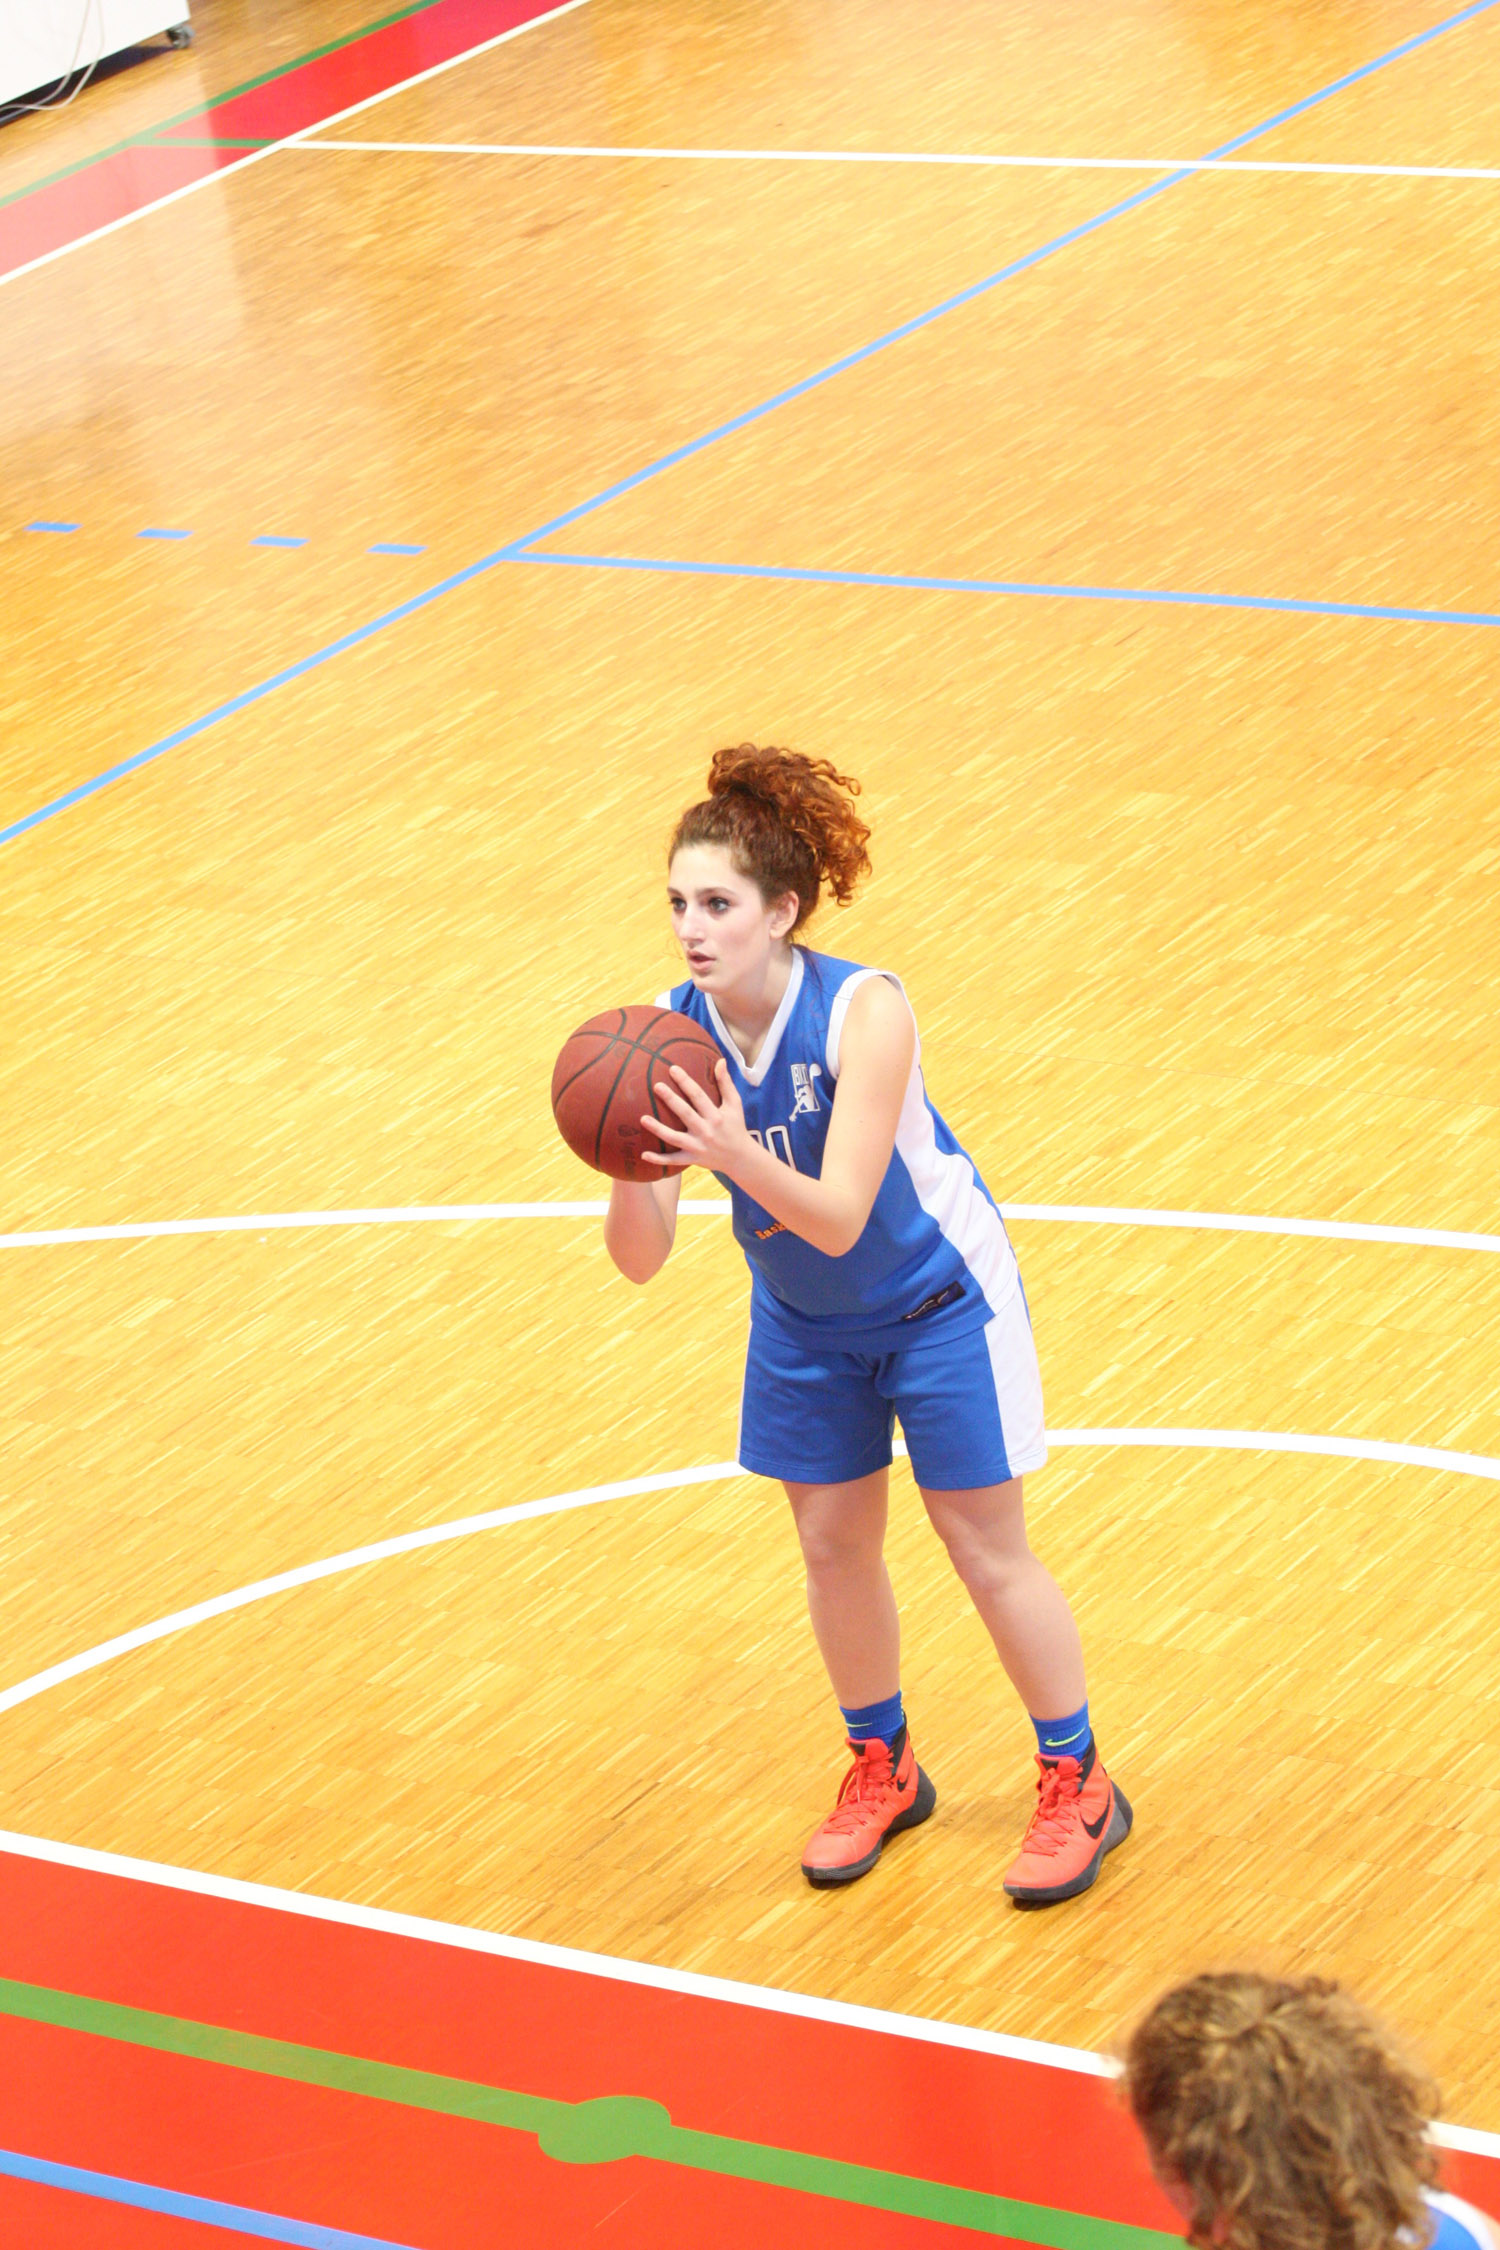 U16E - Costa Masnaga vs Baskettiamo Vittuone 2001 00029.jpg